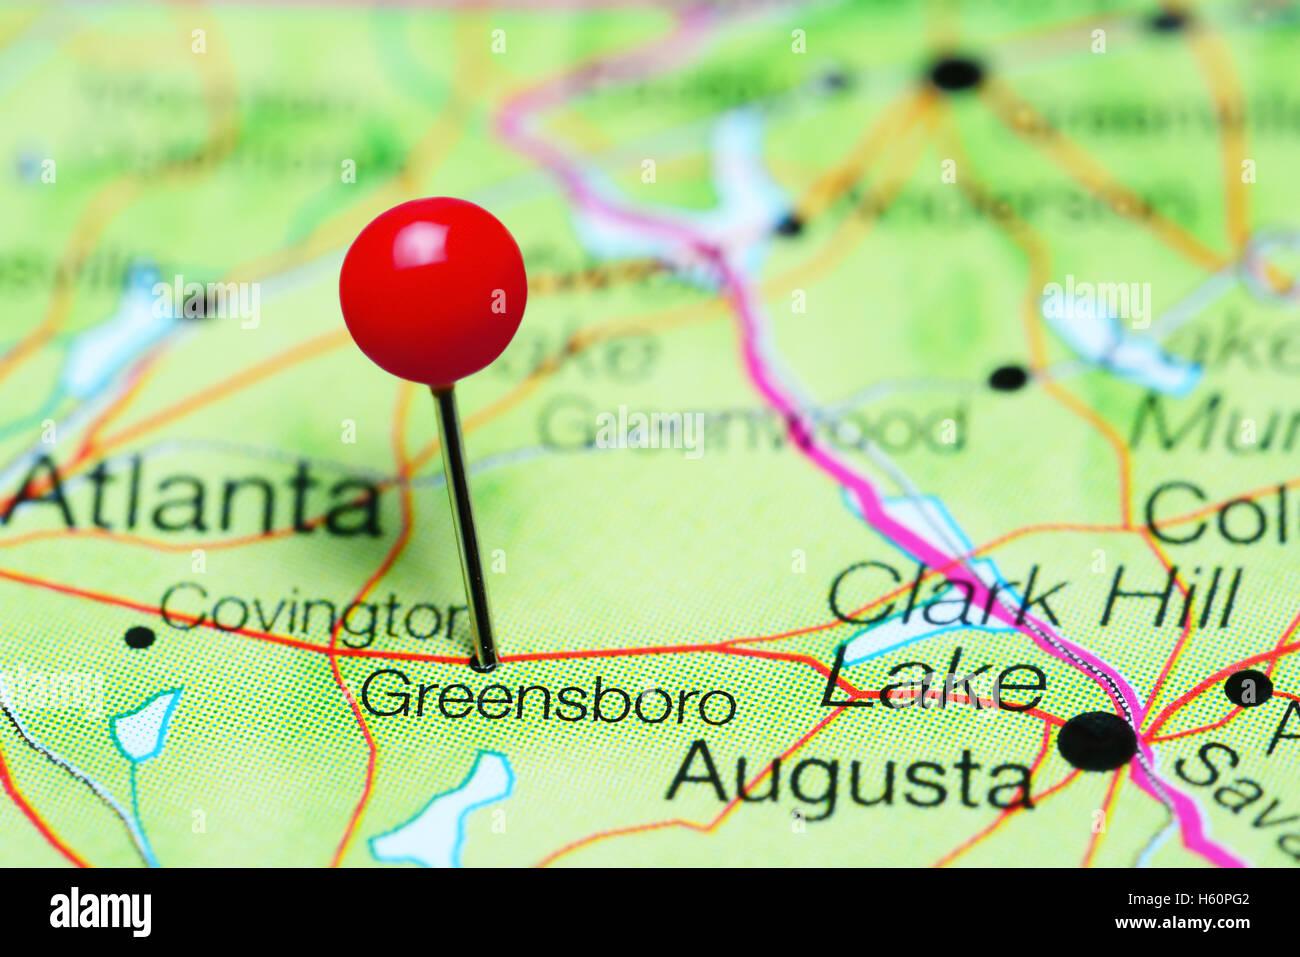 Greensboro Georgia Map.Greensboro Pinned On A Map Of Georgia Usa Stock Photo 124178210